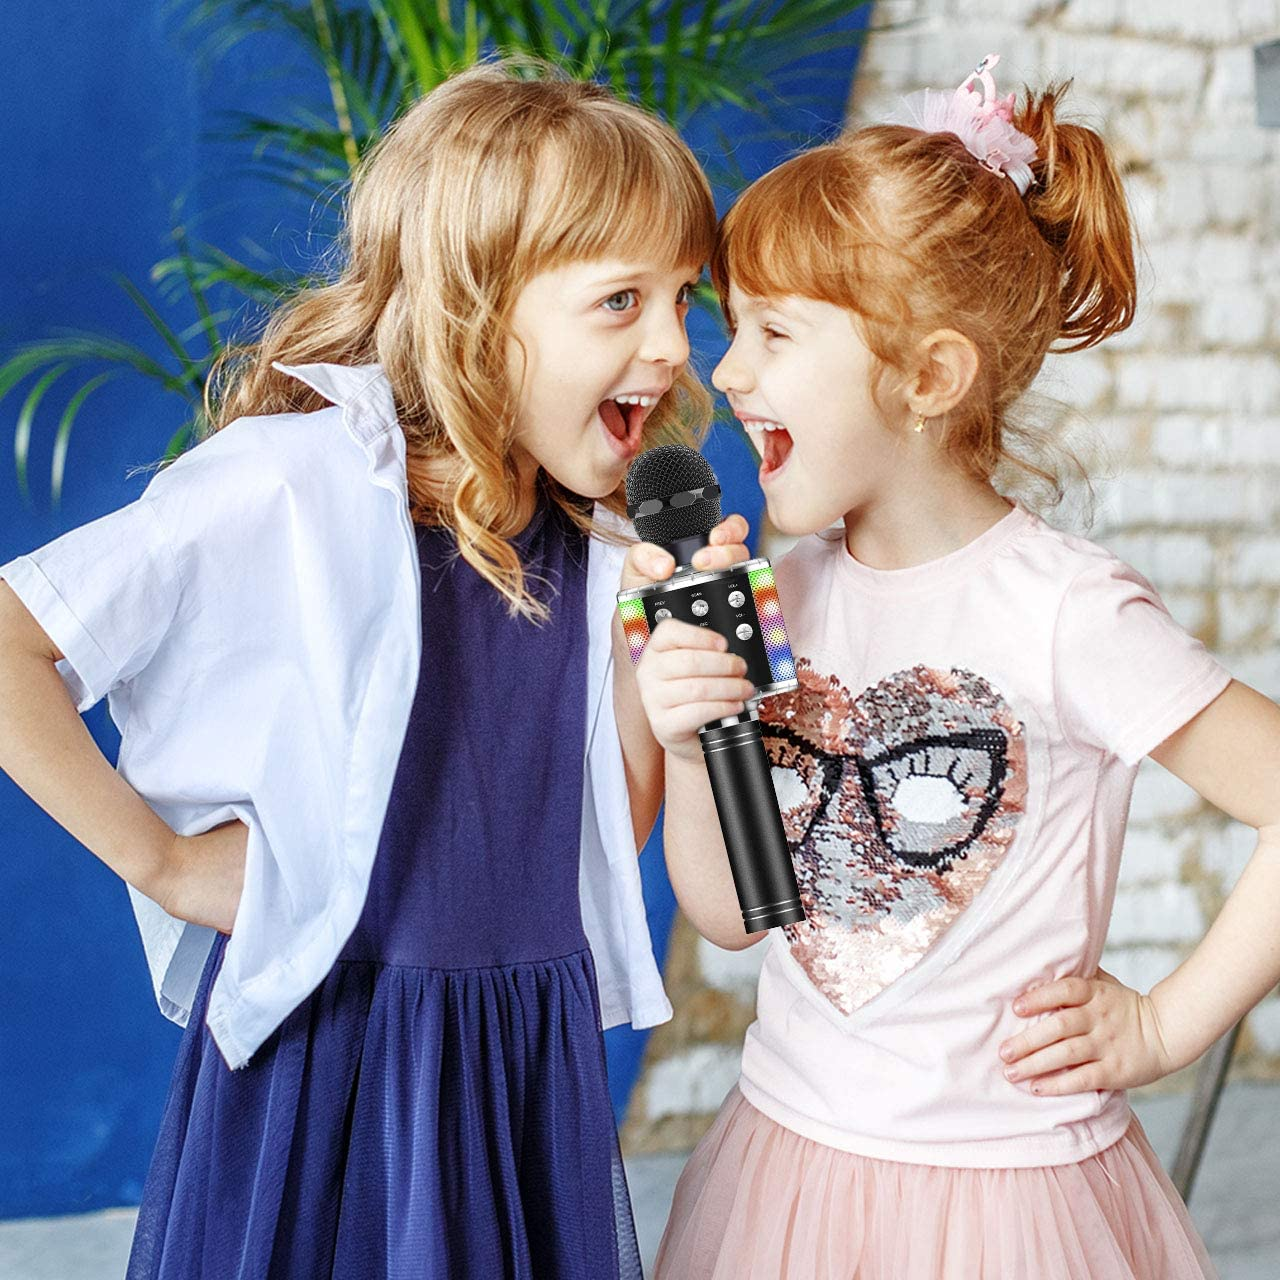 ATOPDREAM Multifunktionale Bluetooth Mikrofon Gute Klangqualit/ät Sch/önes Aussehen Kinder